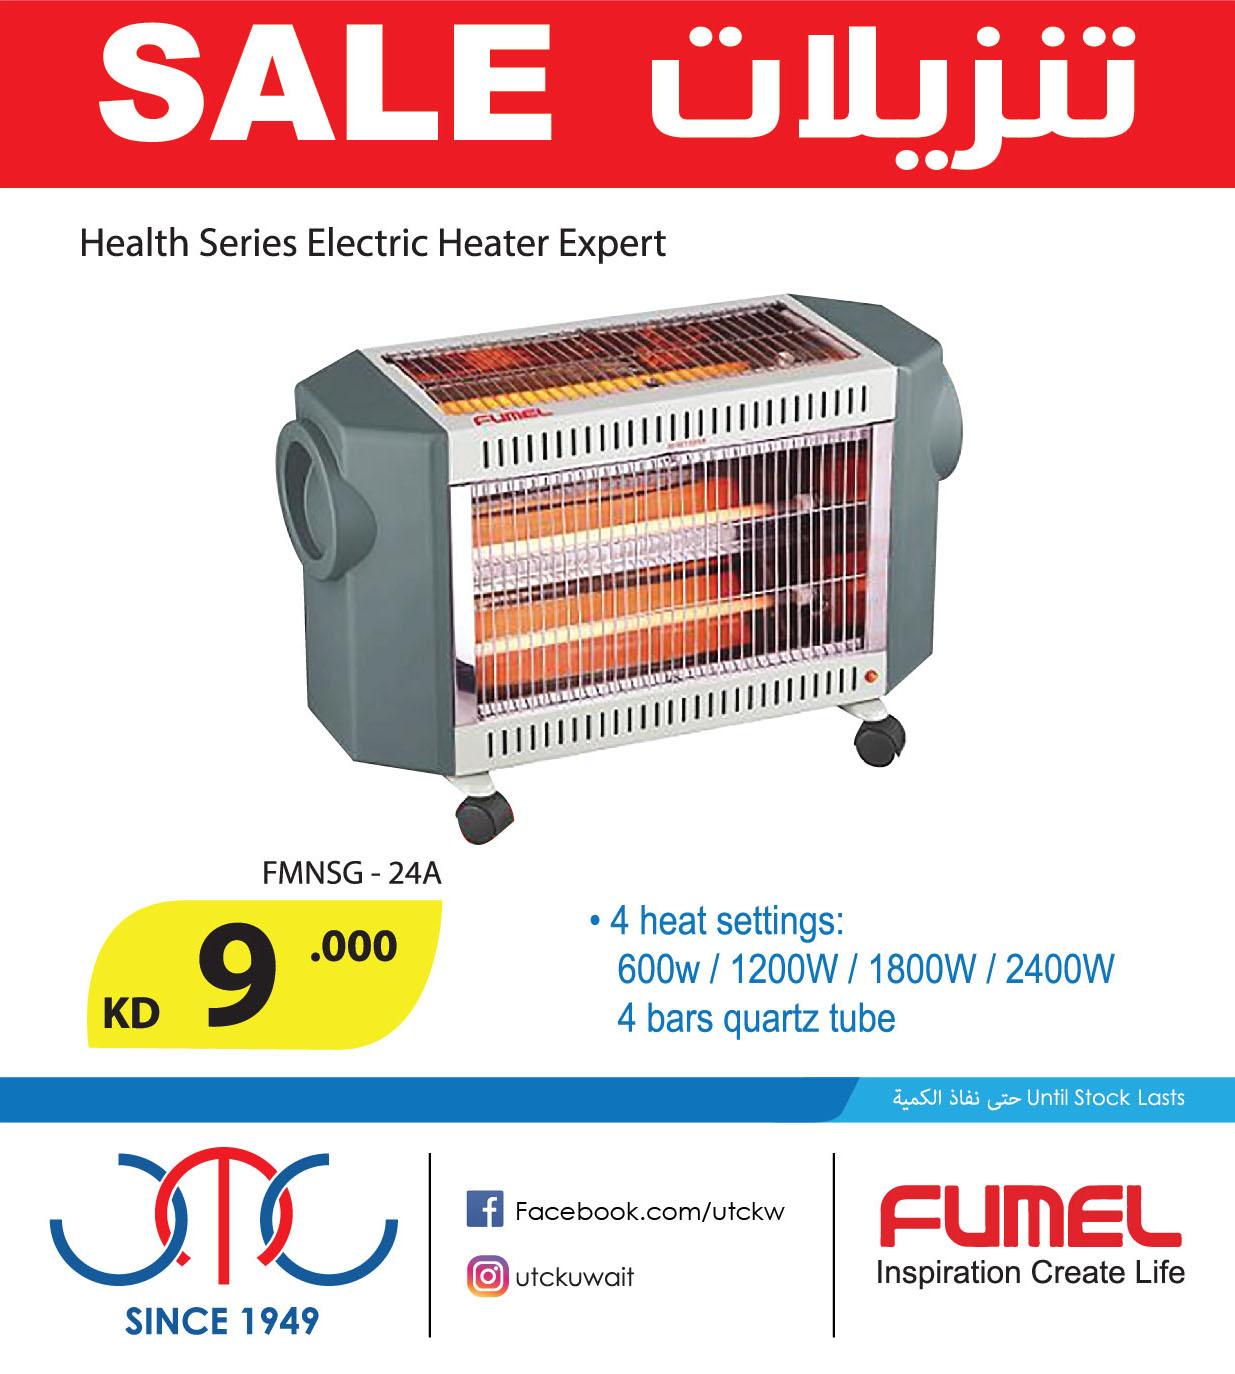 Fumel - Electric Heater